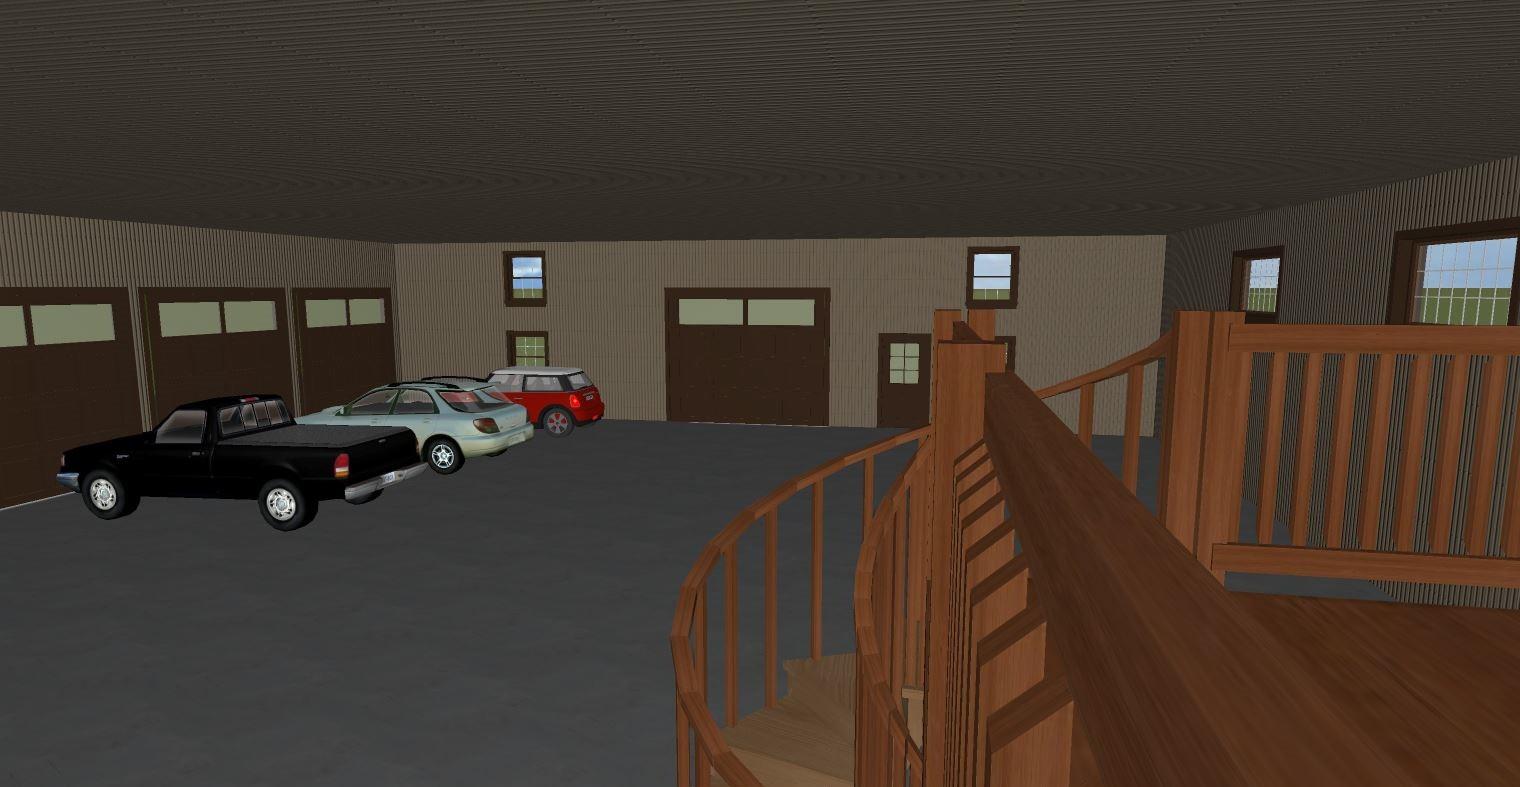 pole building, site planning, 3D rendering